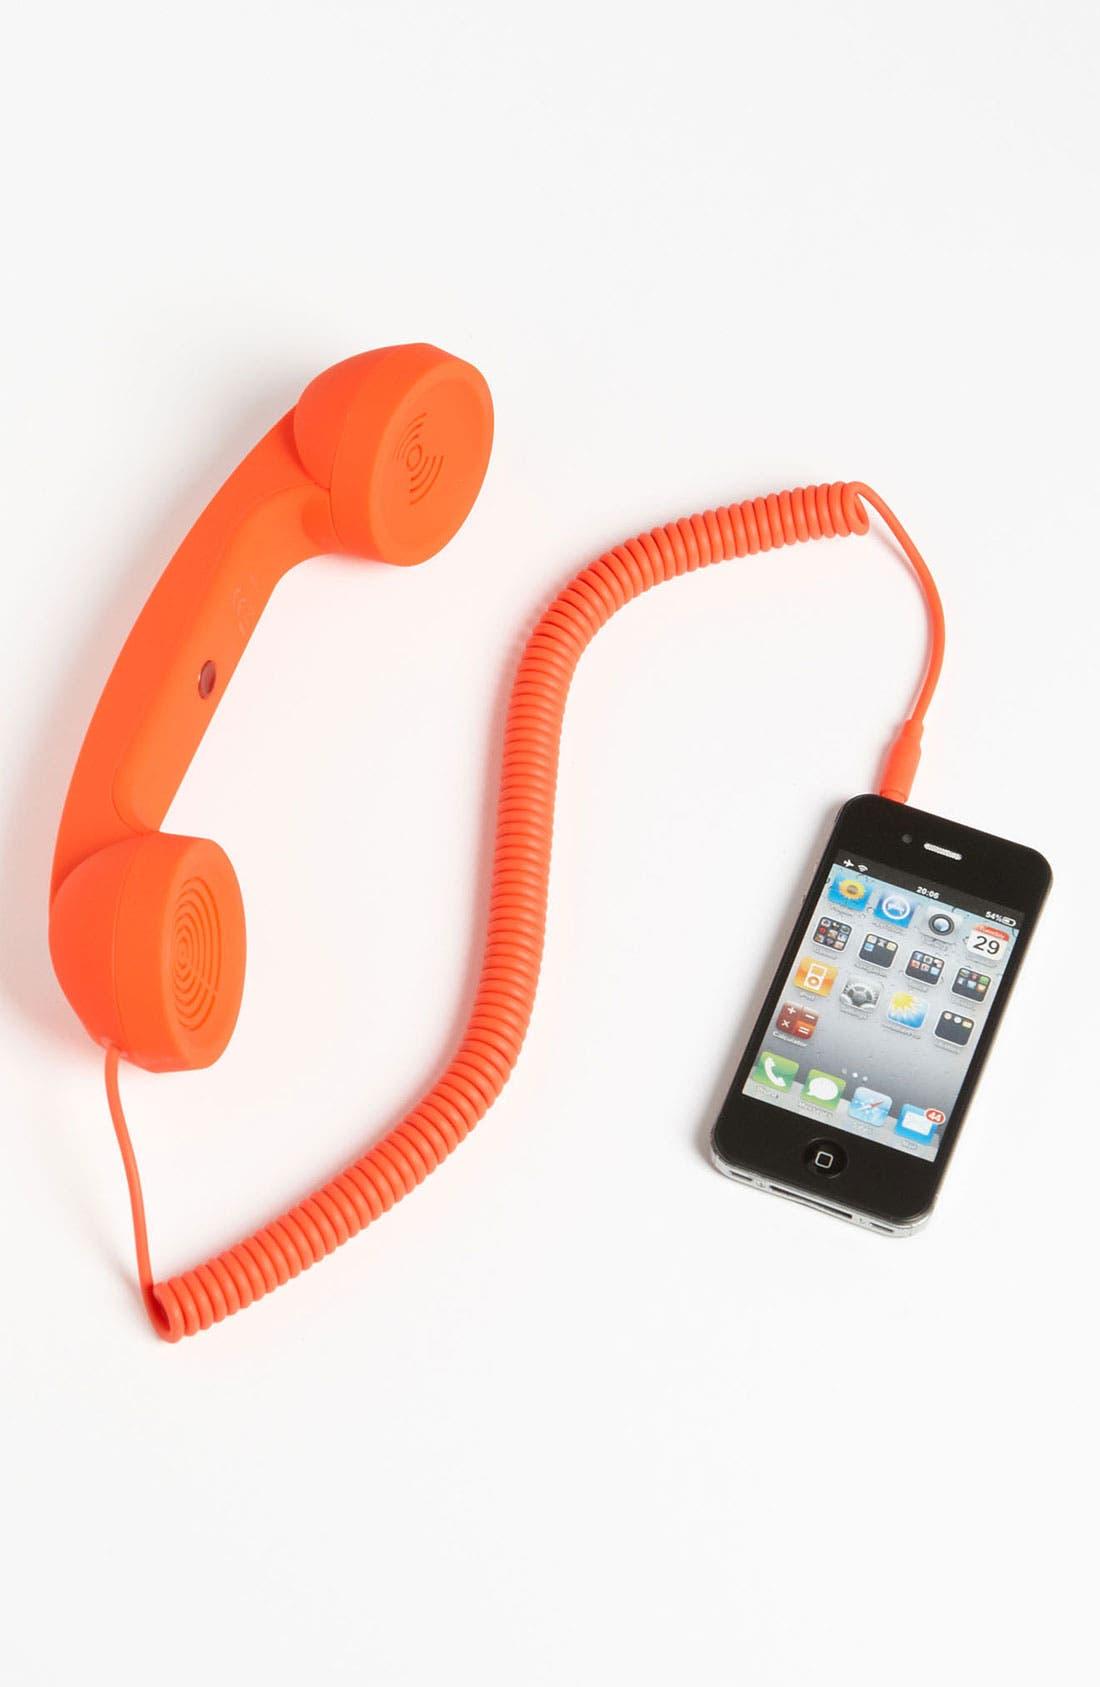 Main Image - Native Union 'Neon Pop Phone' Handset